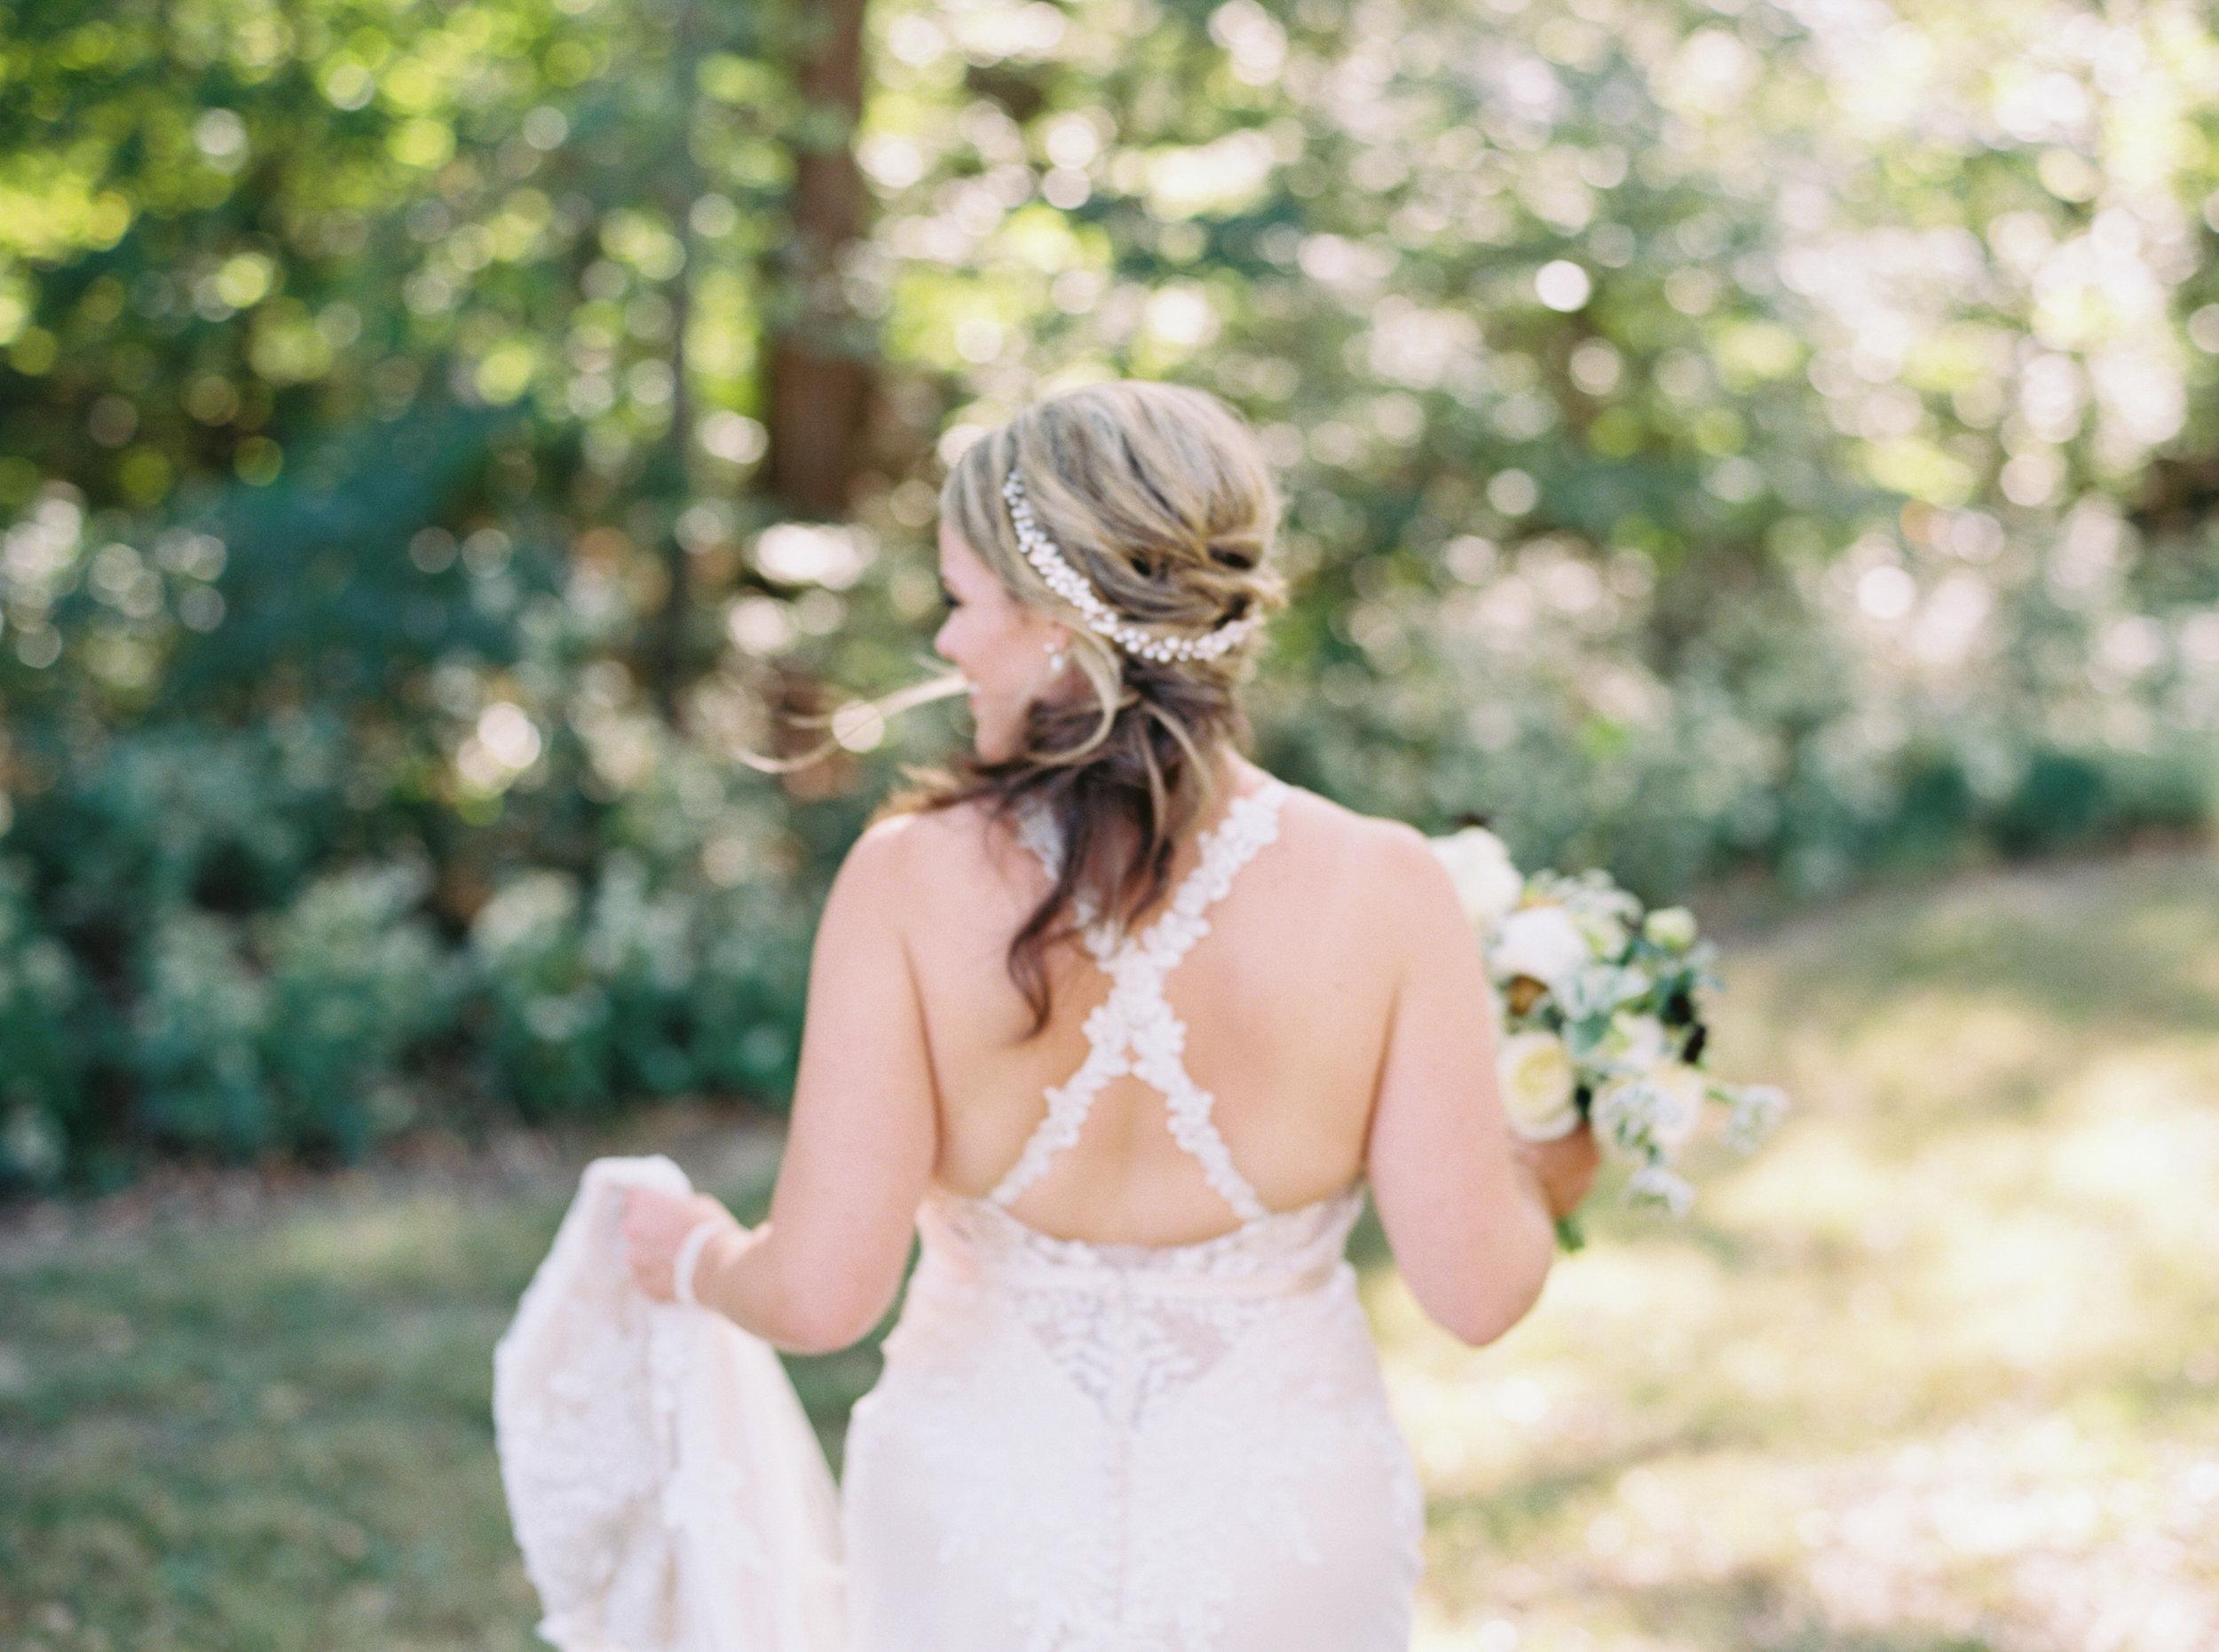 Abby_Simon_Wedding_Abigail_Malone_Photography_nashville_Bloomsbury_Farm-227.jpg